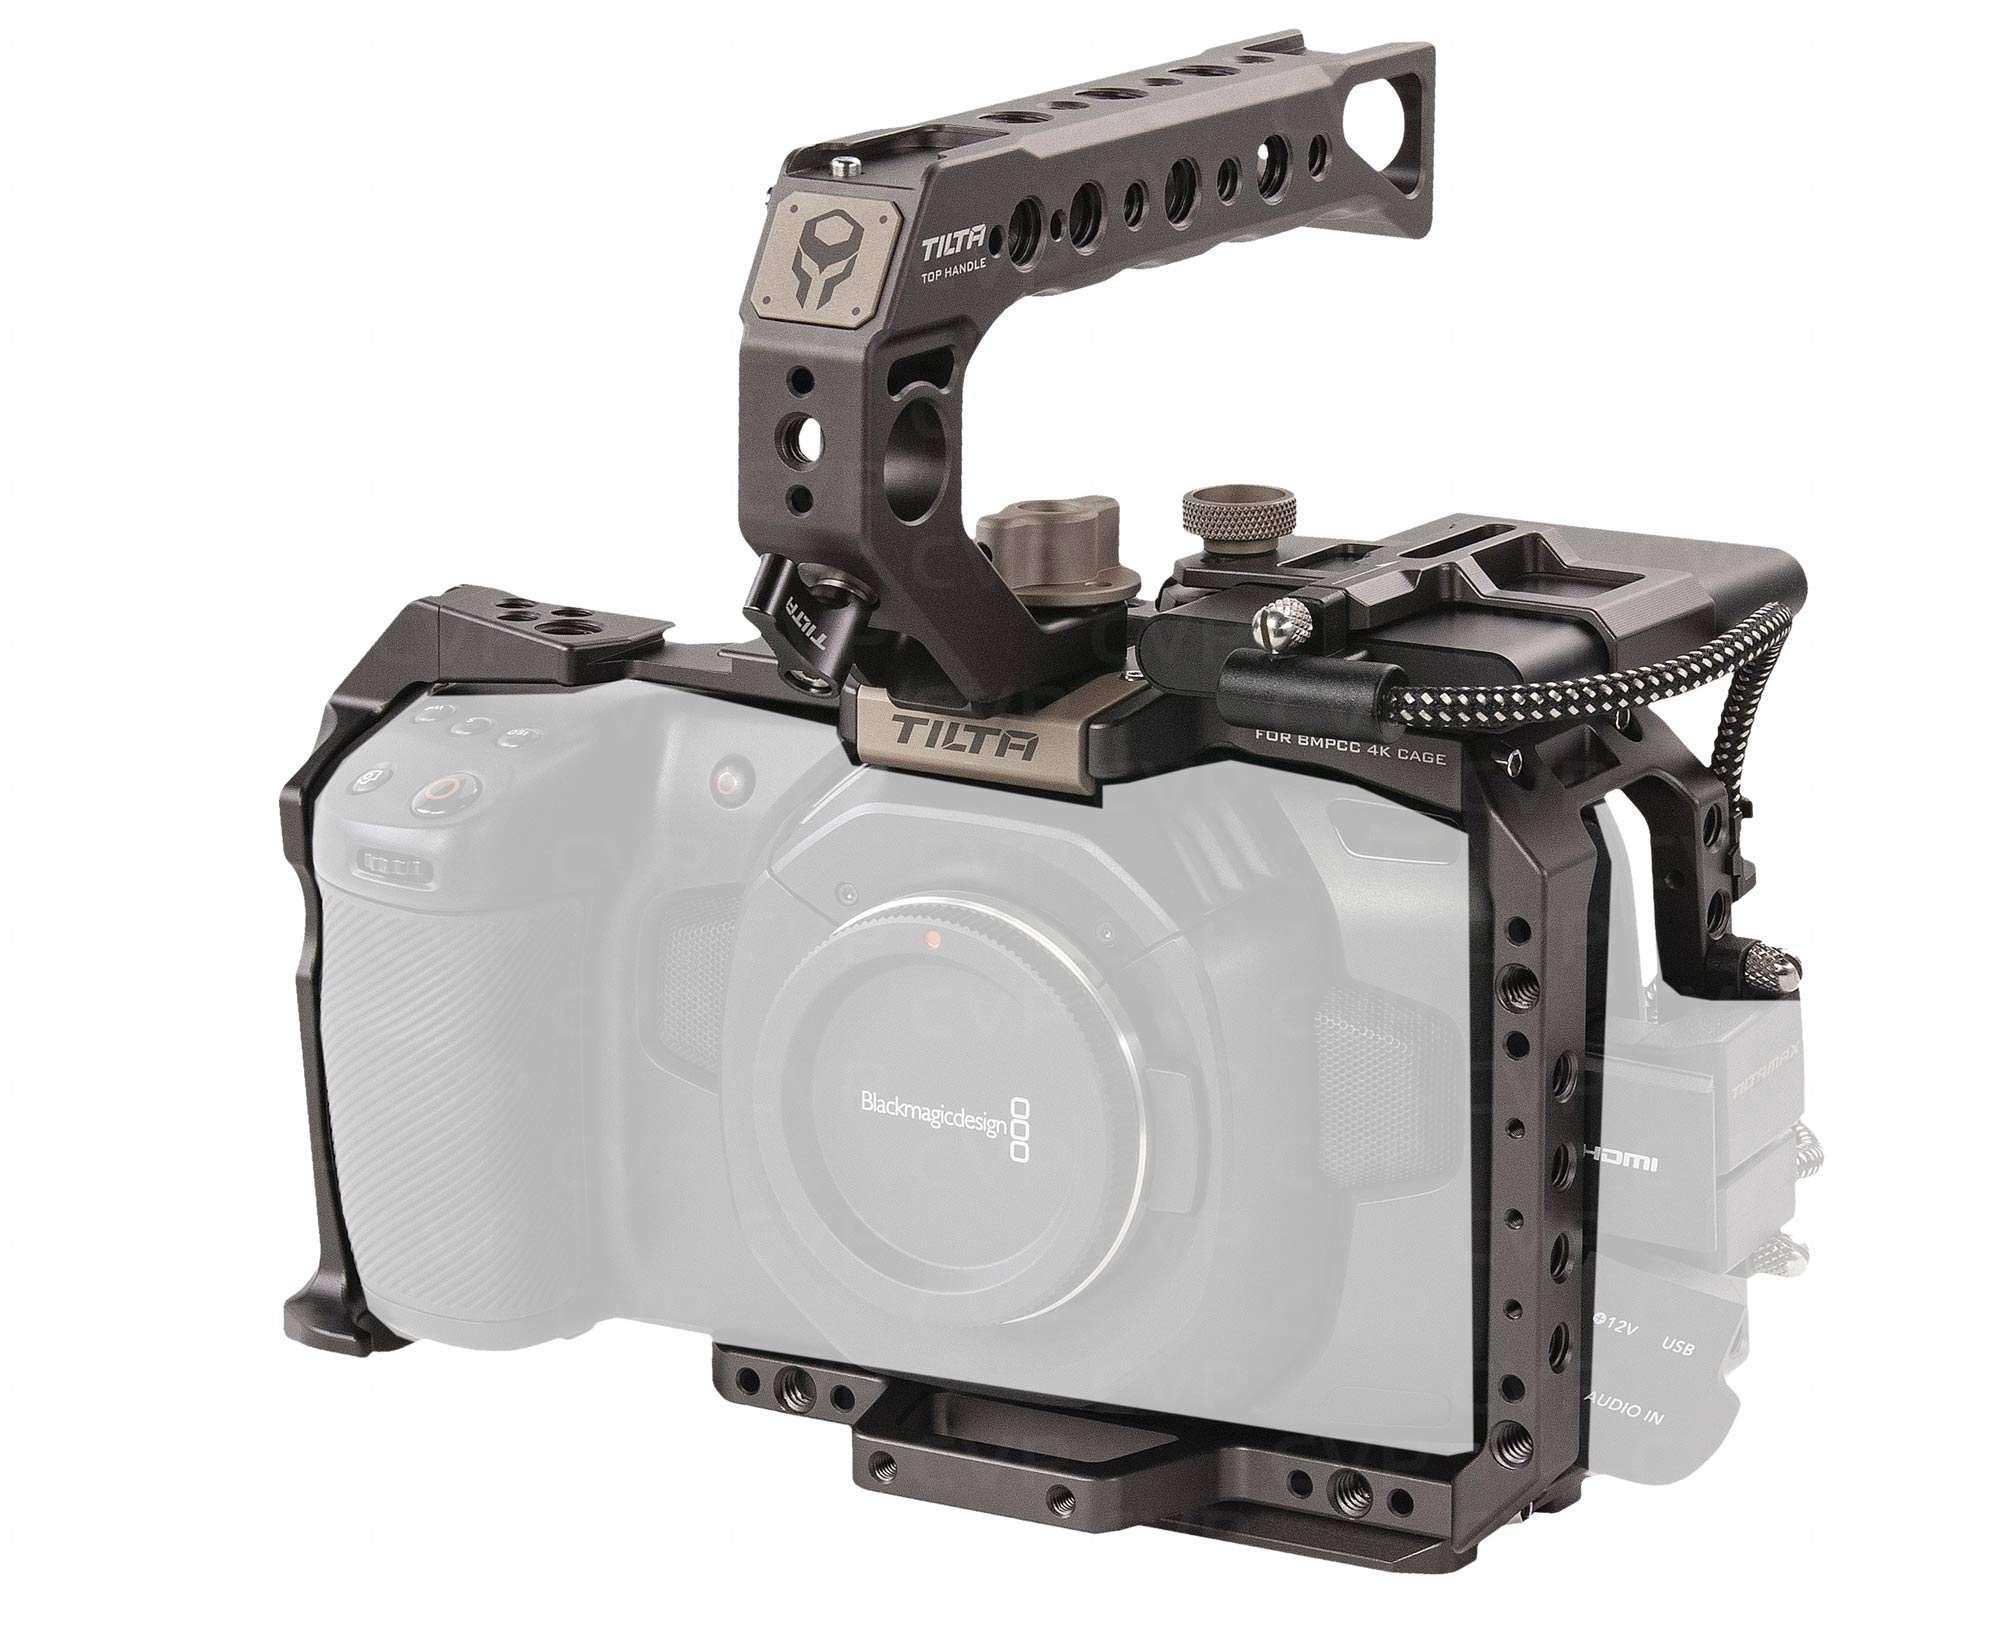 Buy Tilta Ta T01 B G Tat01bg Tilta Grey Assault Armor Camera Cage For Blackmagic Pocket Cinema Camera 4k Basic Module